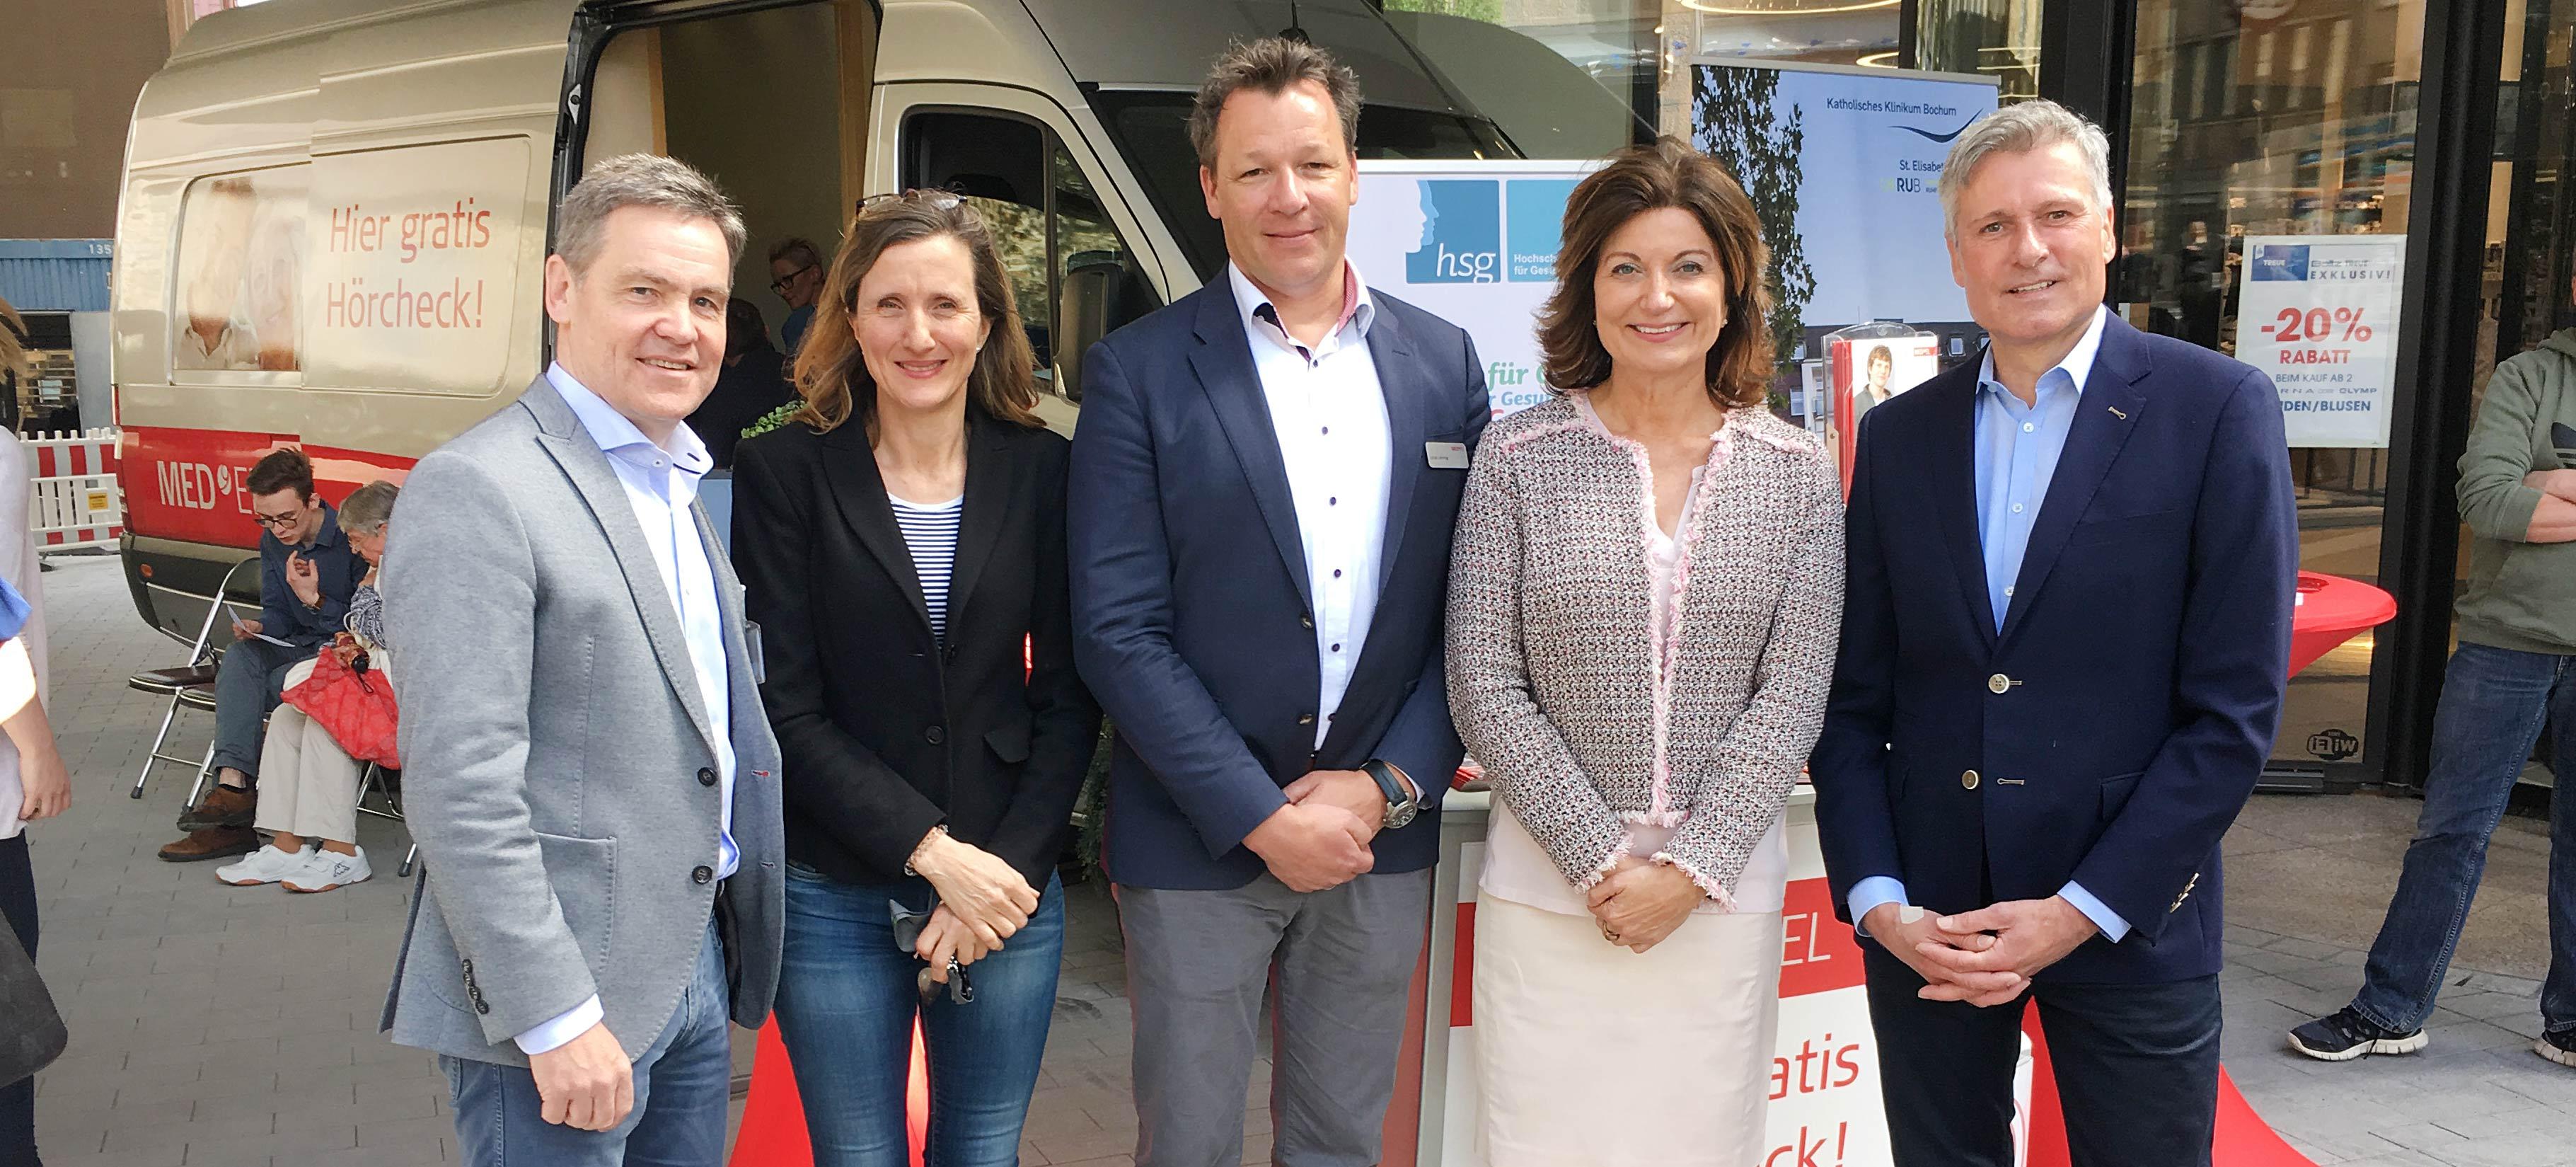 Prof. Dr. Stefan Dazert, PD Dr. Christiane Völter, Prof. Dr. Kerstin Bilda, Dirk Kampmann vor dem Hörmobil in der Bochumer Innenstadt.